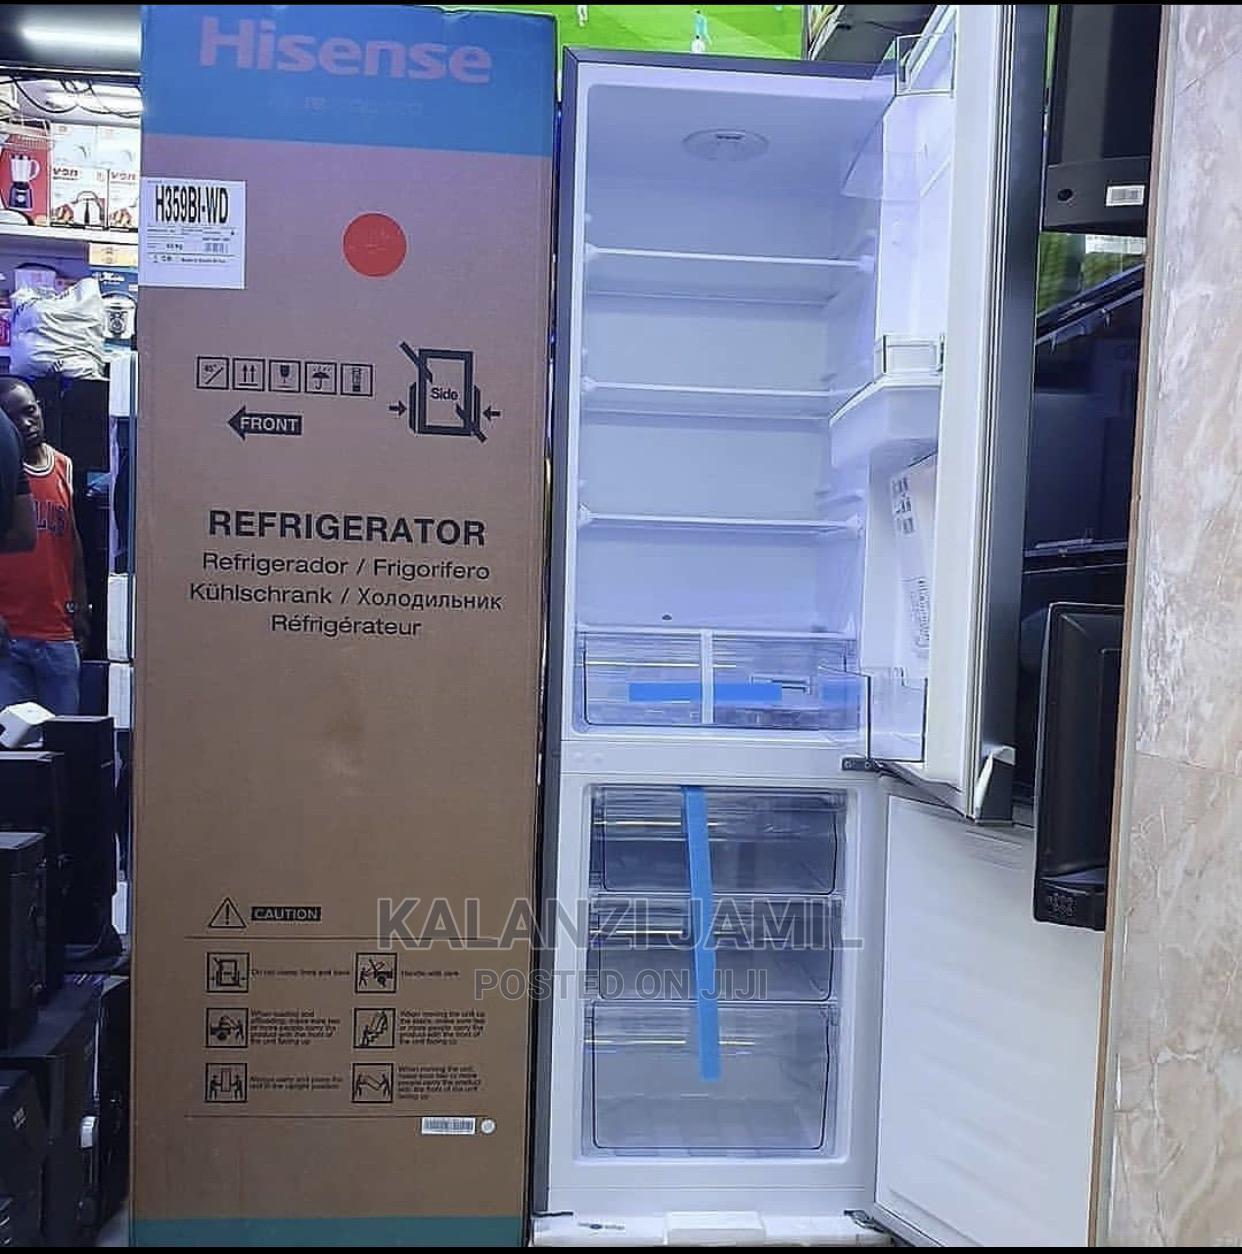 341 Litres Hisense Refrigerators Available